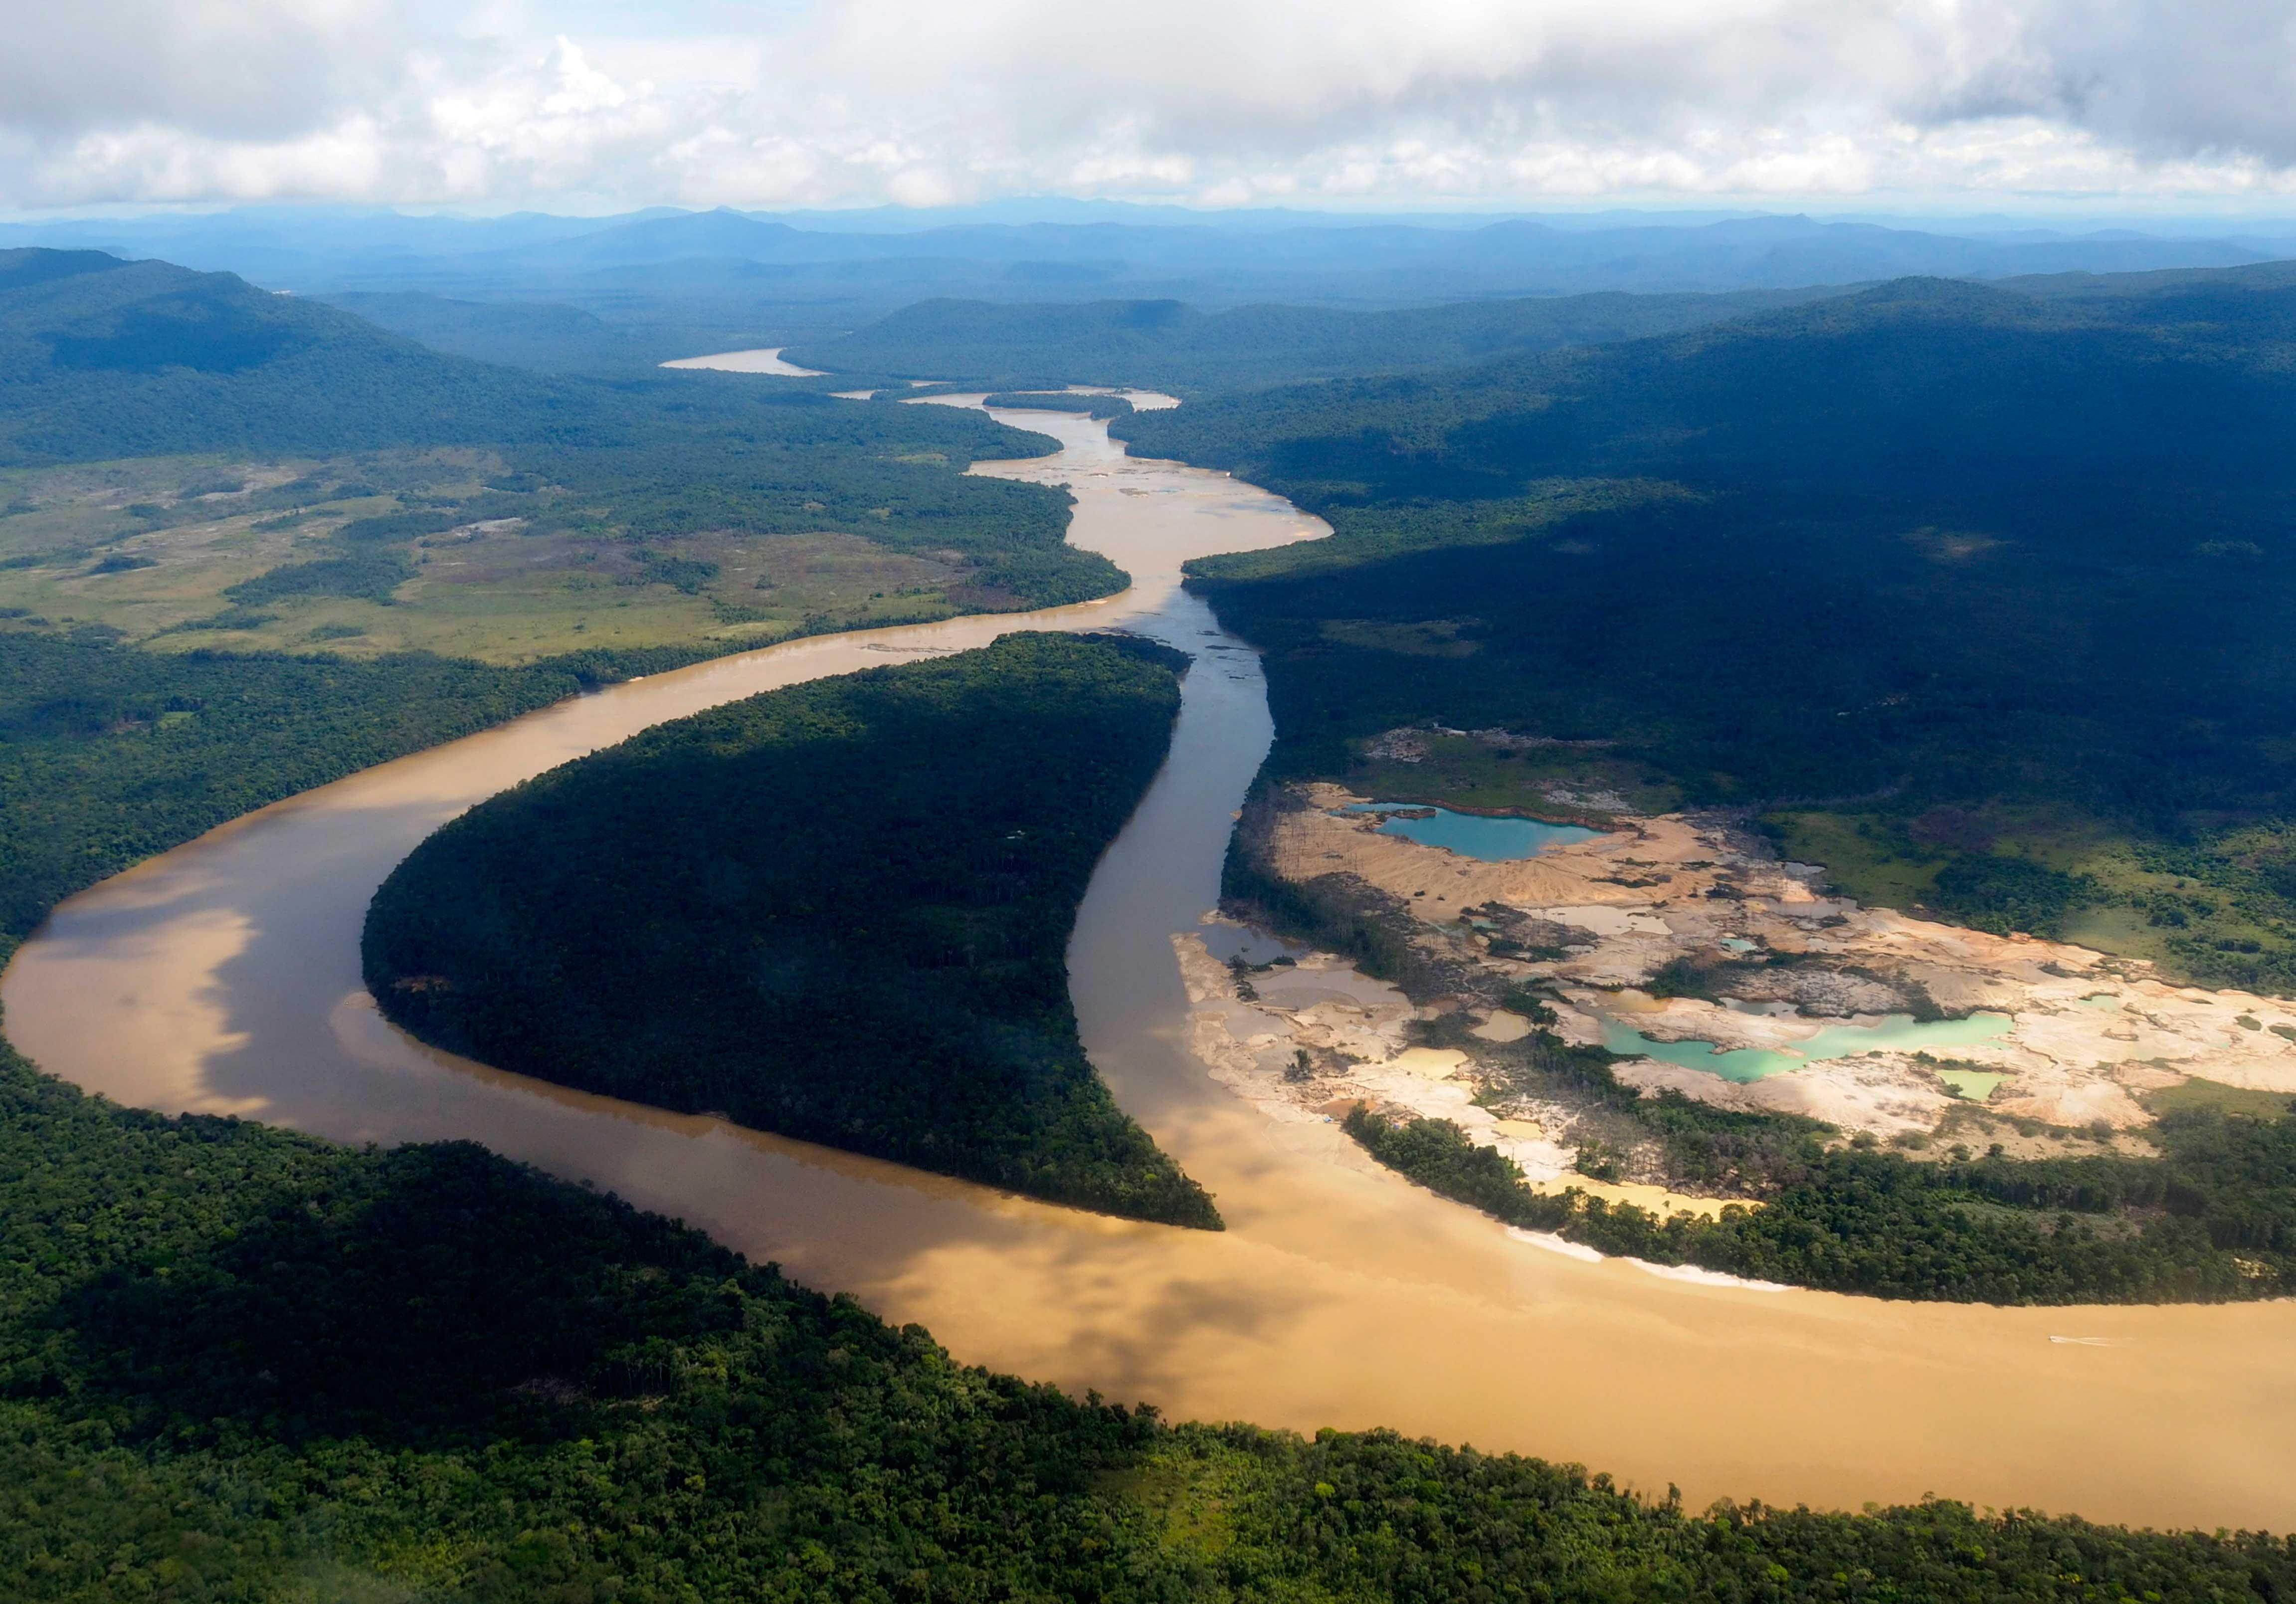 Amazonía en la encrucijada - Territorio Amazonas | Ojo Público